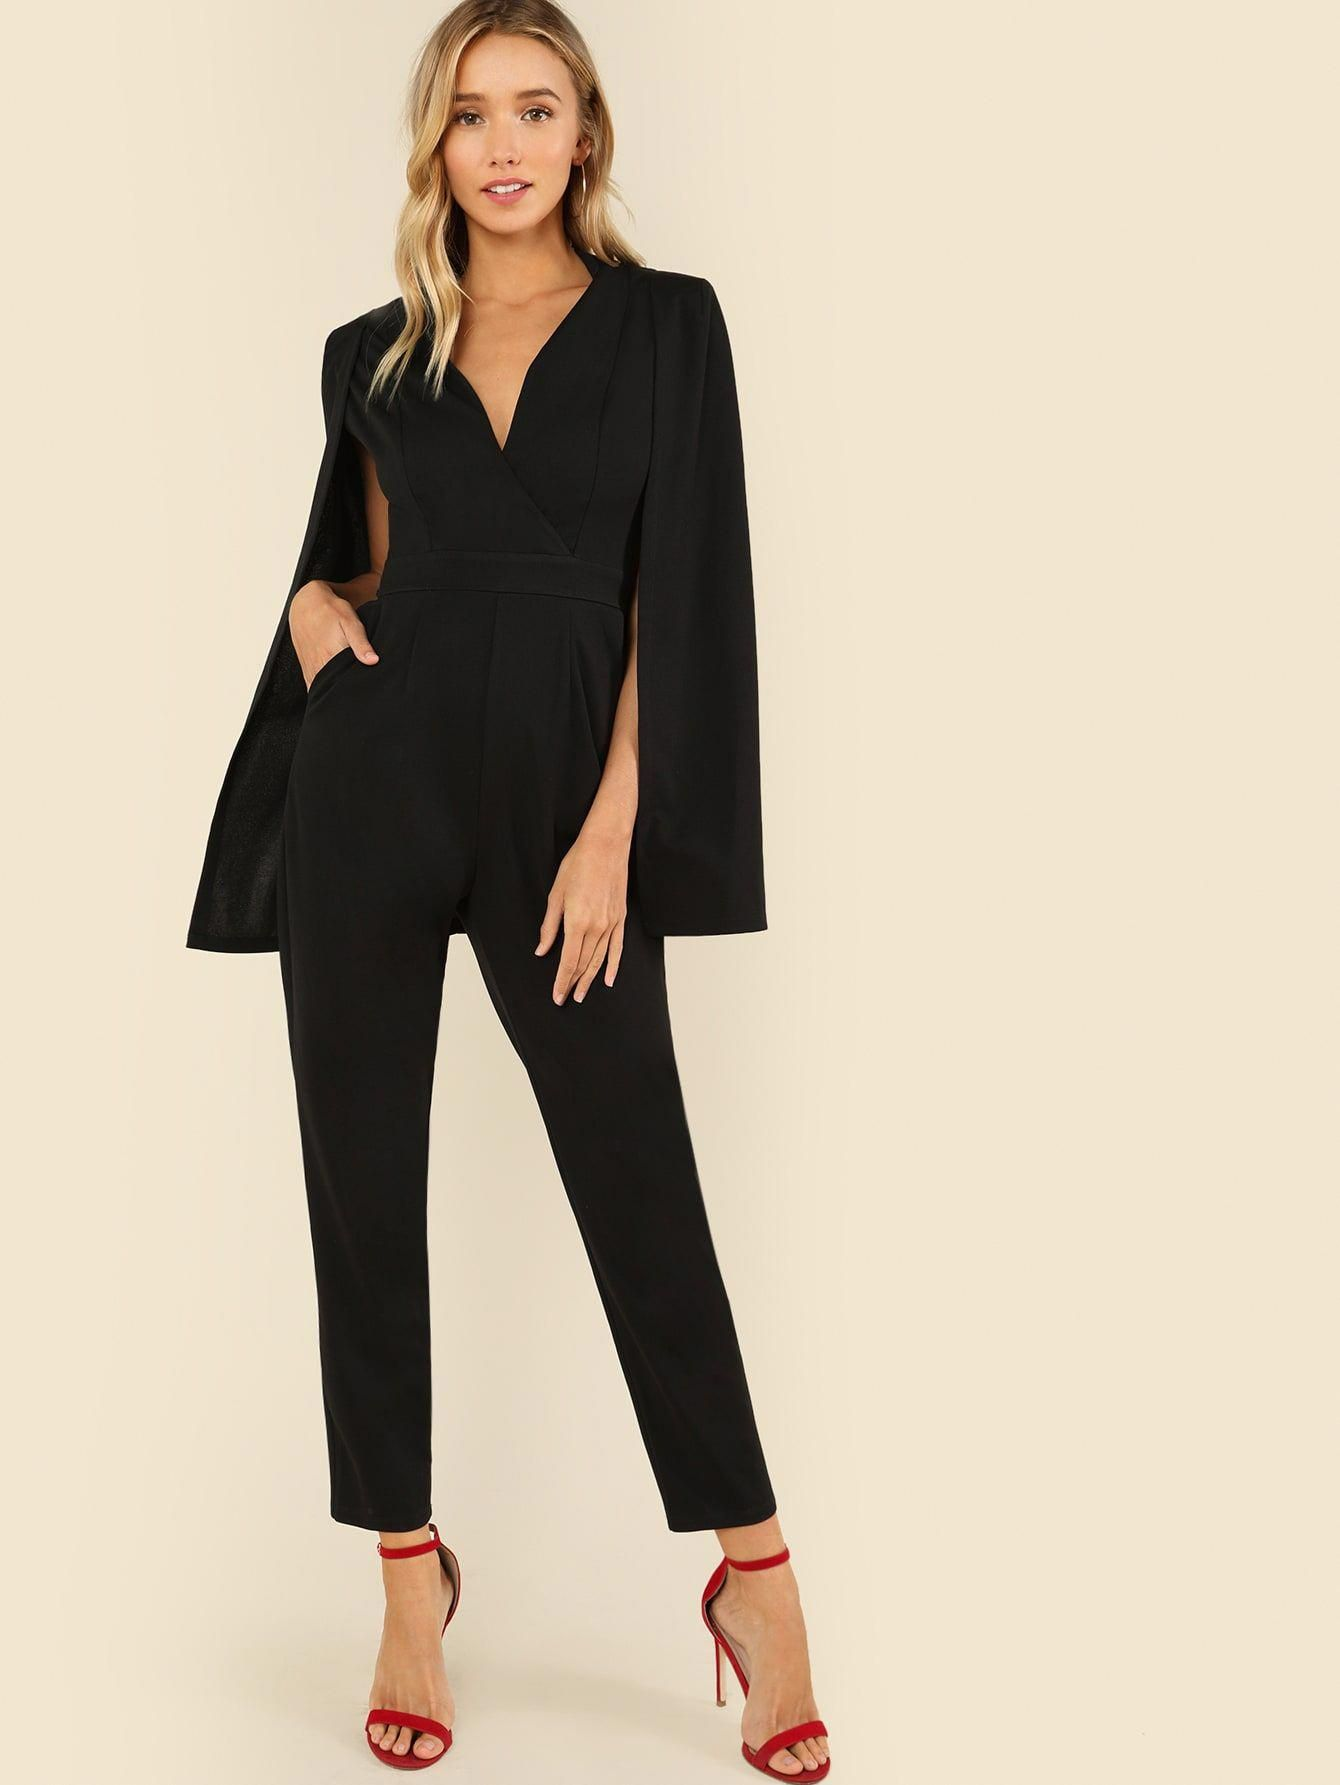 e4a1a01ef9 Womens Black Dressy Jumpsuit - raveitsafe